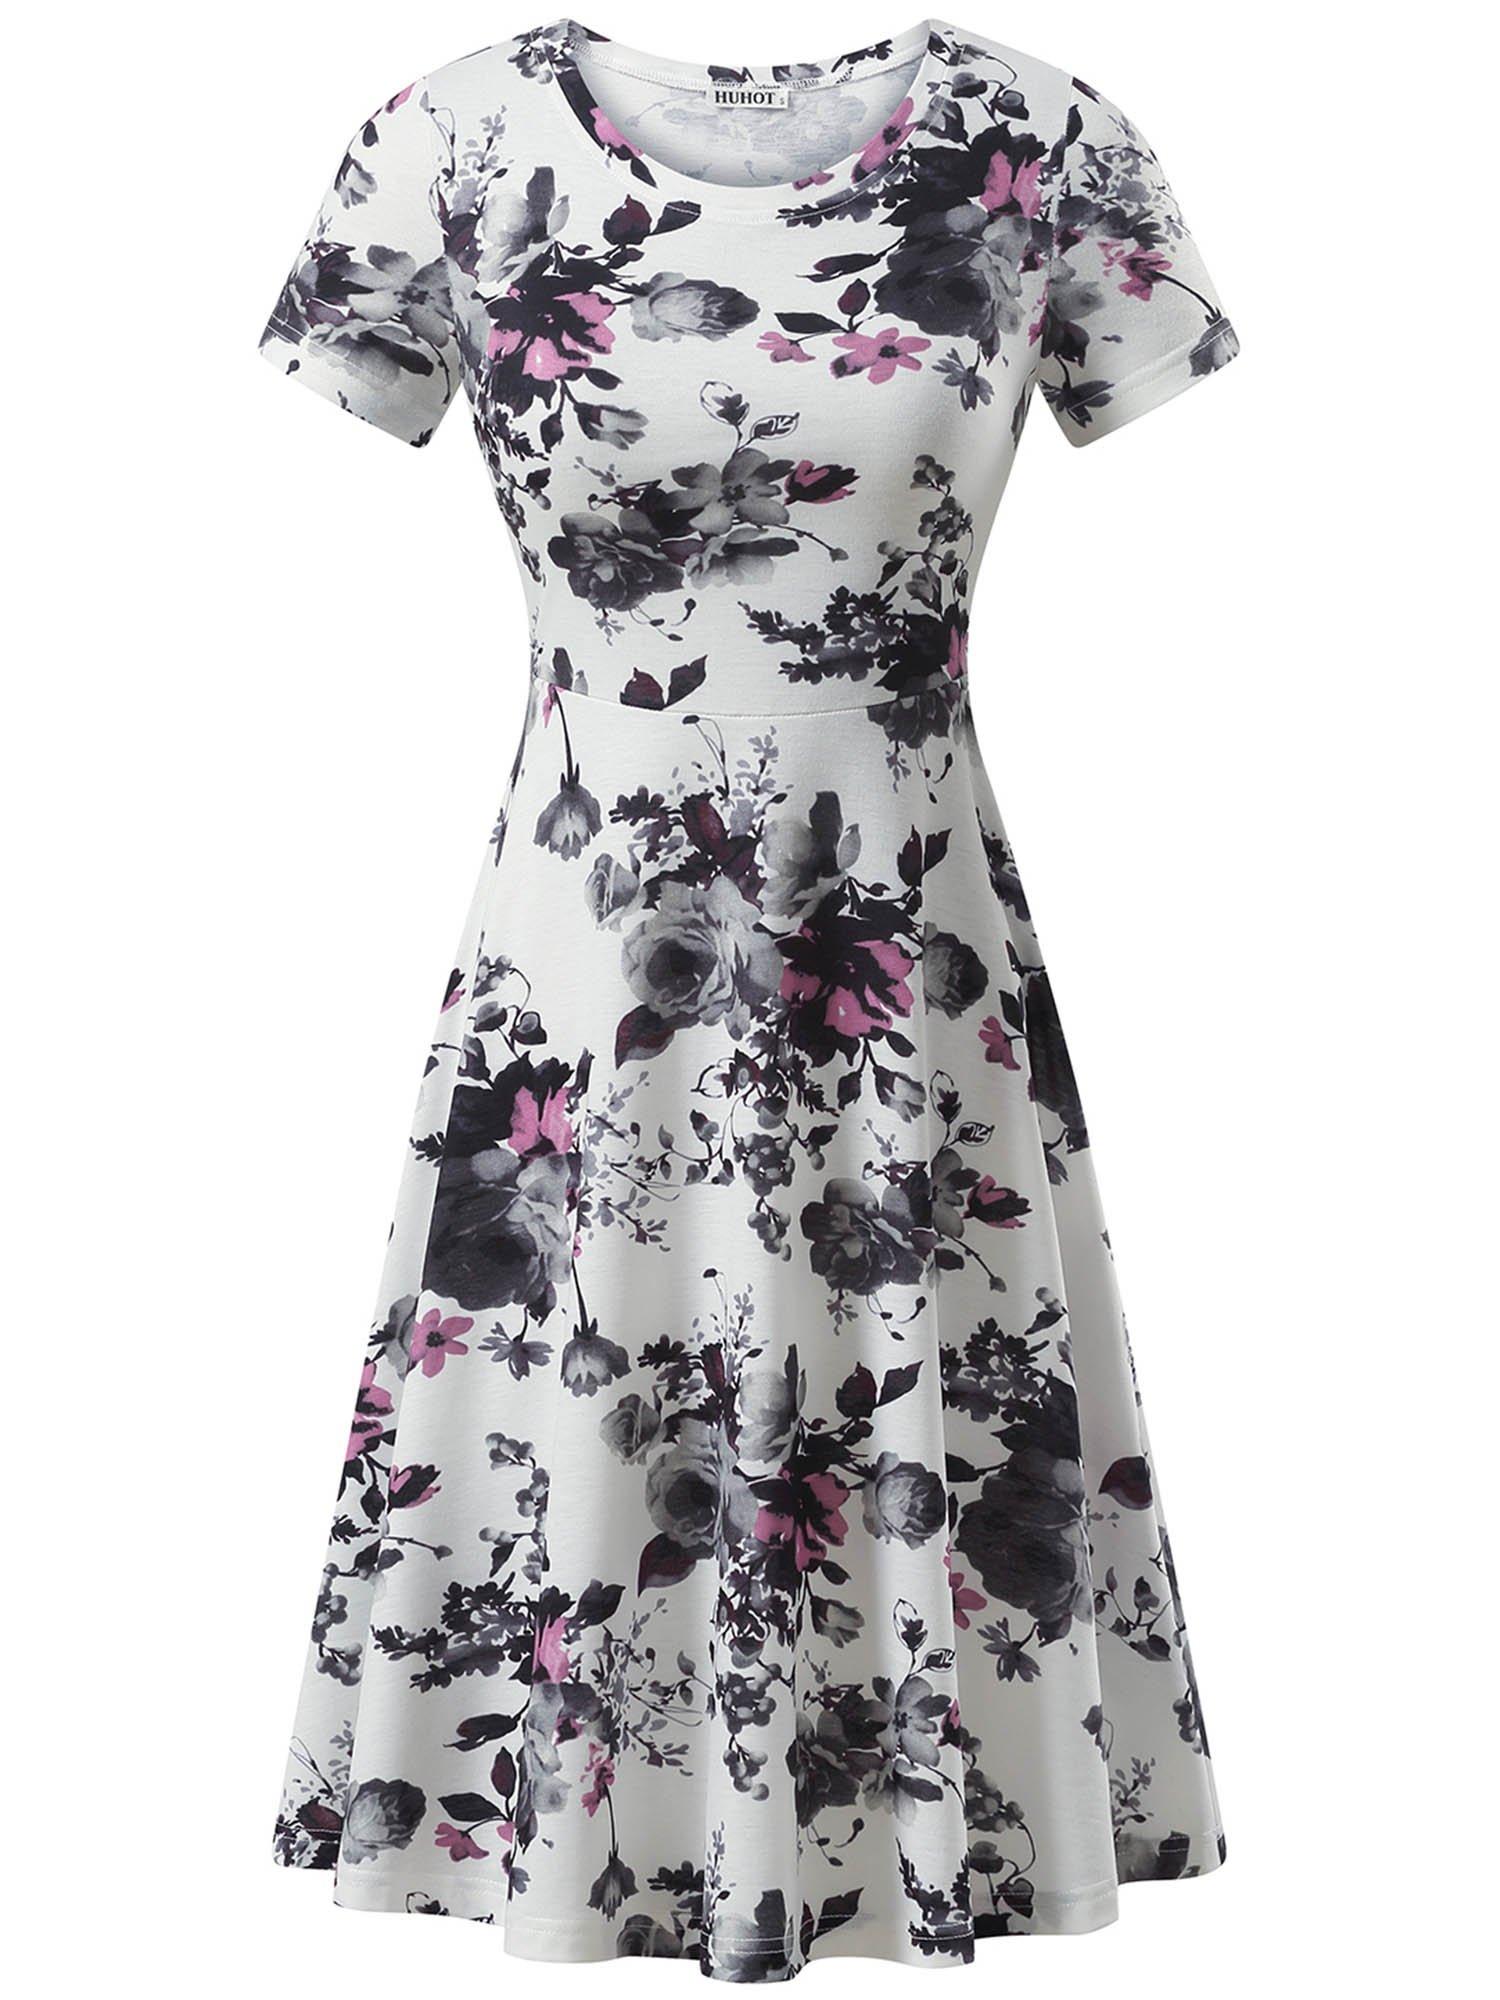 HUHOT Fall Dresses Short Sleeve Round Neck Casual Flared Midi Dress Modest (Large, Print18)